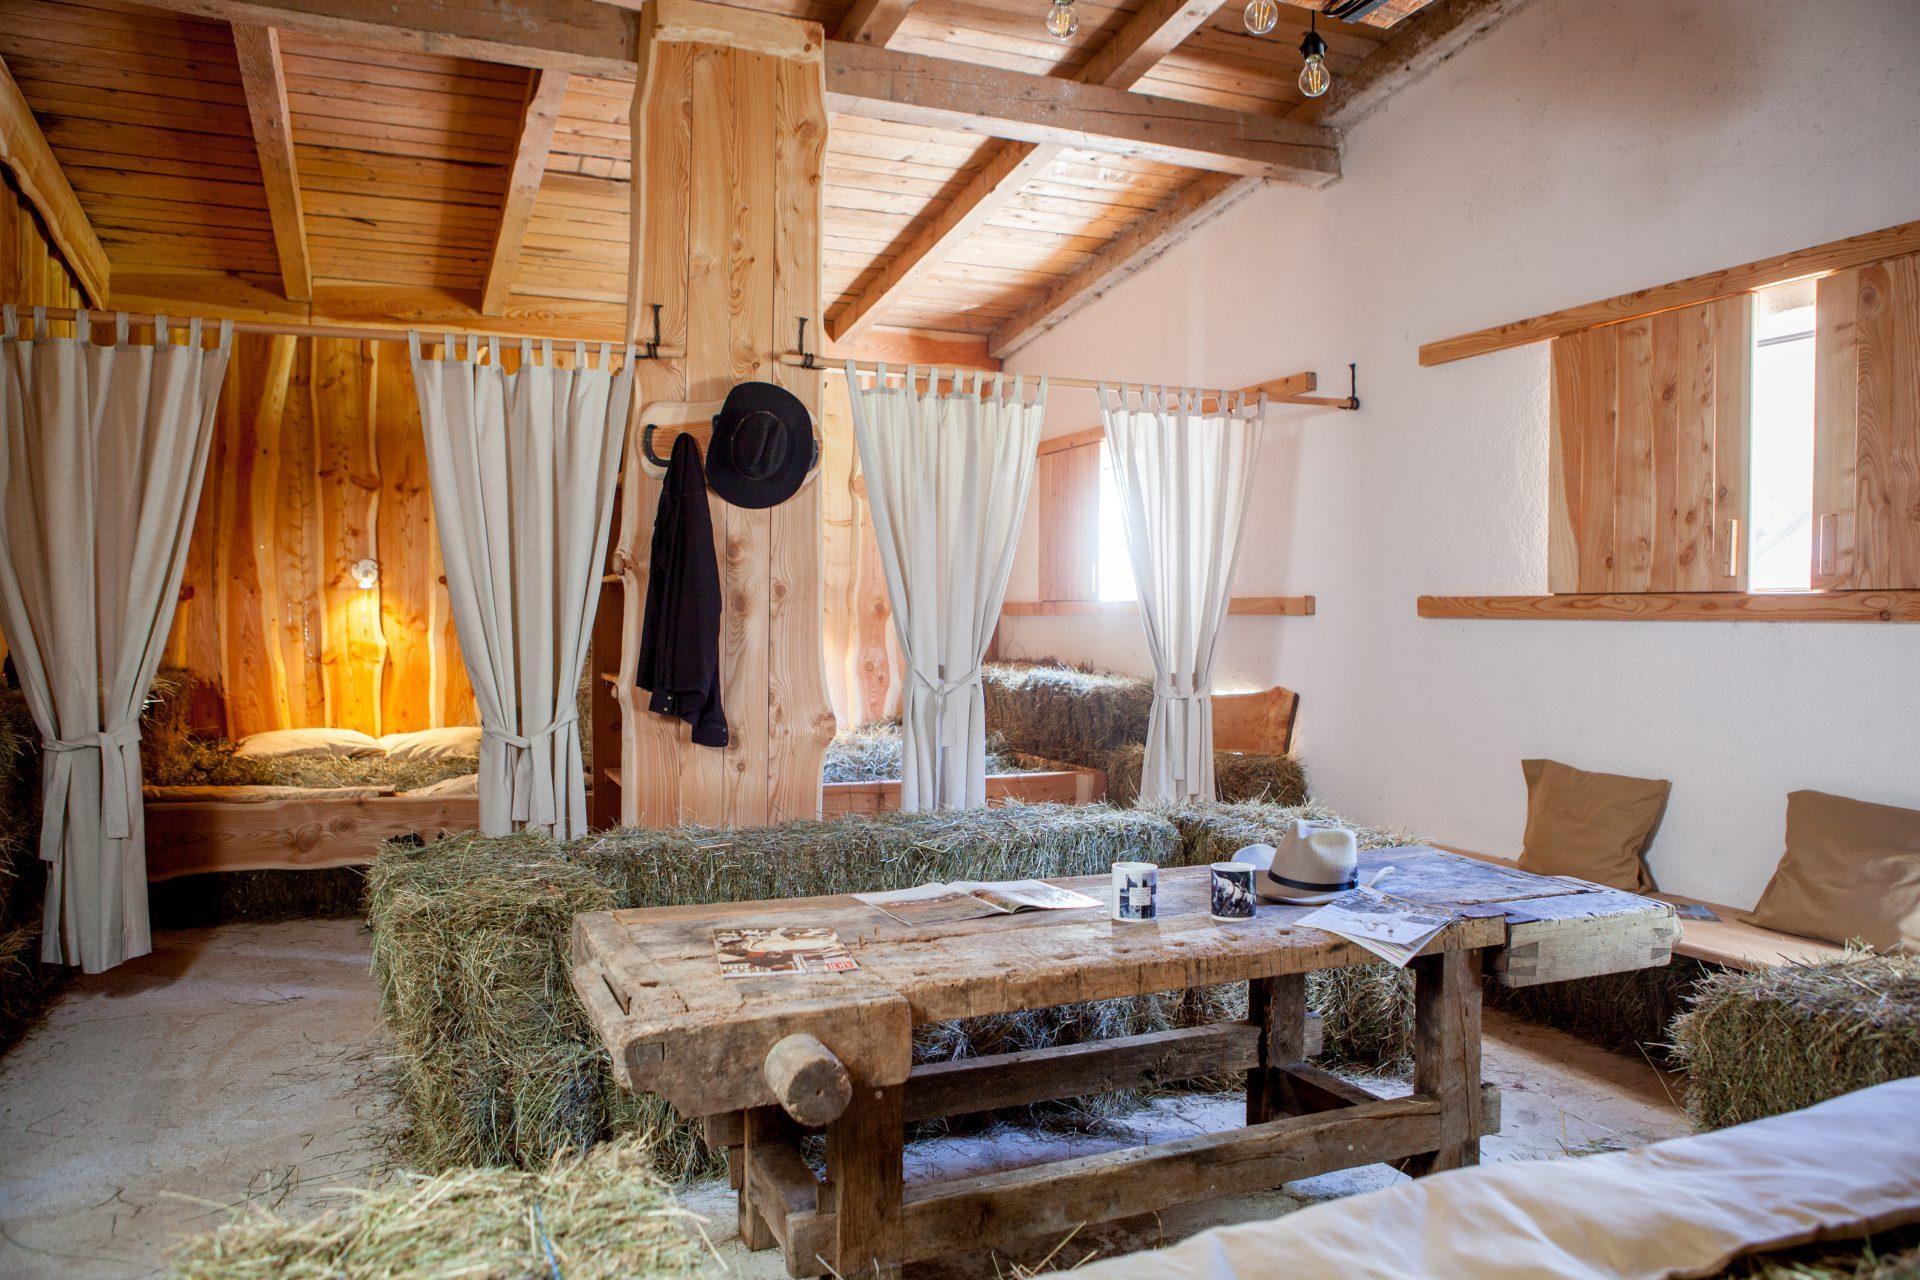 Sleeping on the hay experience